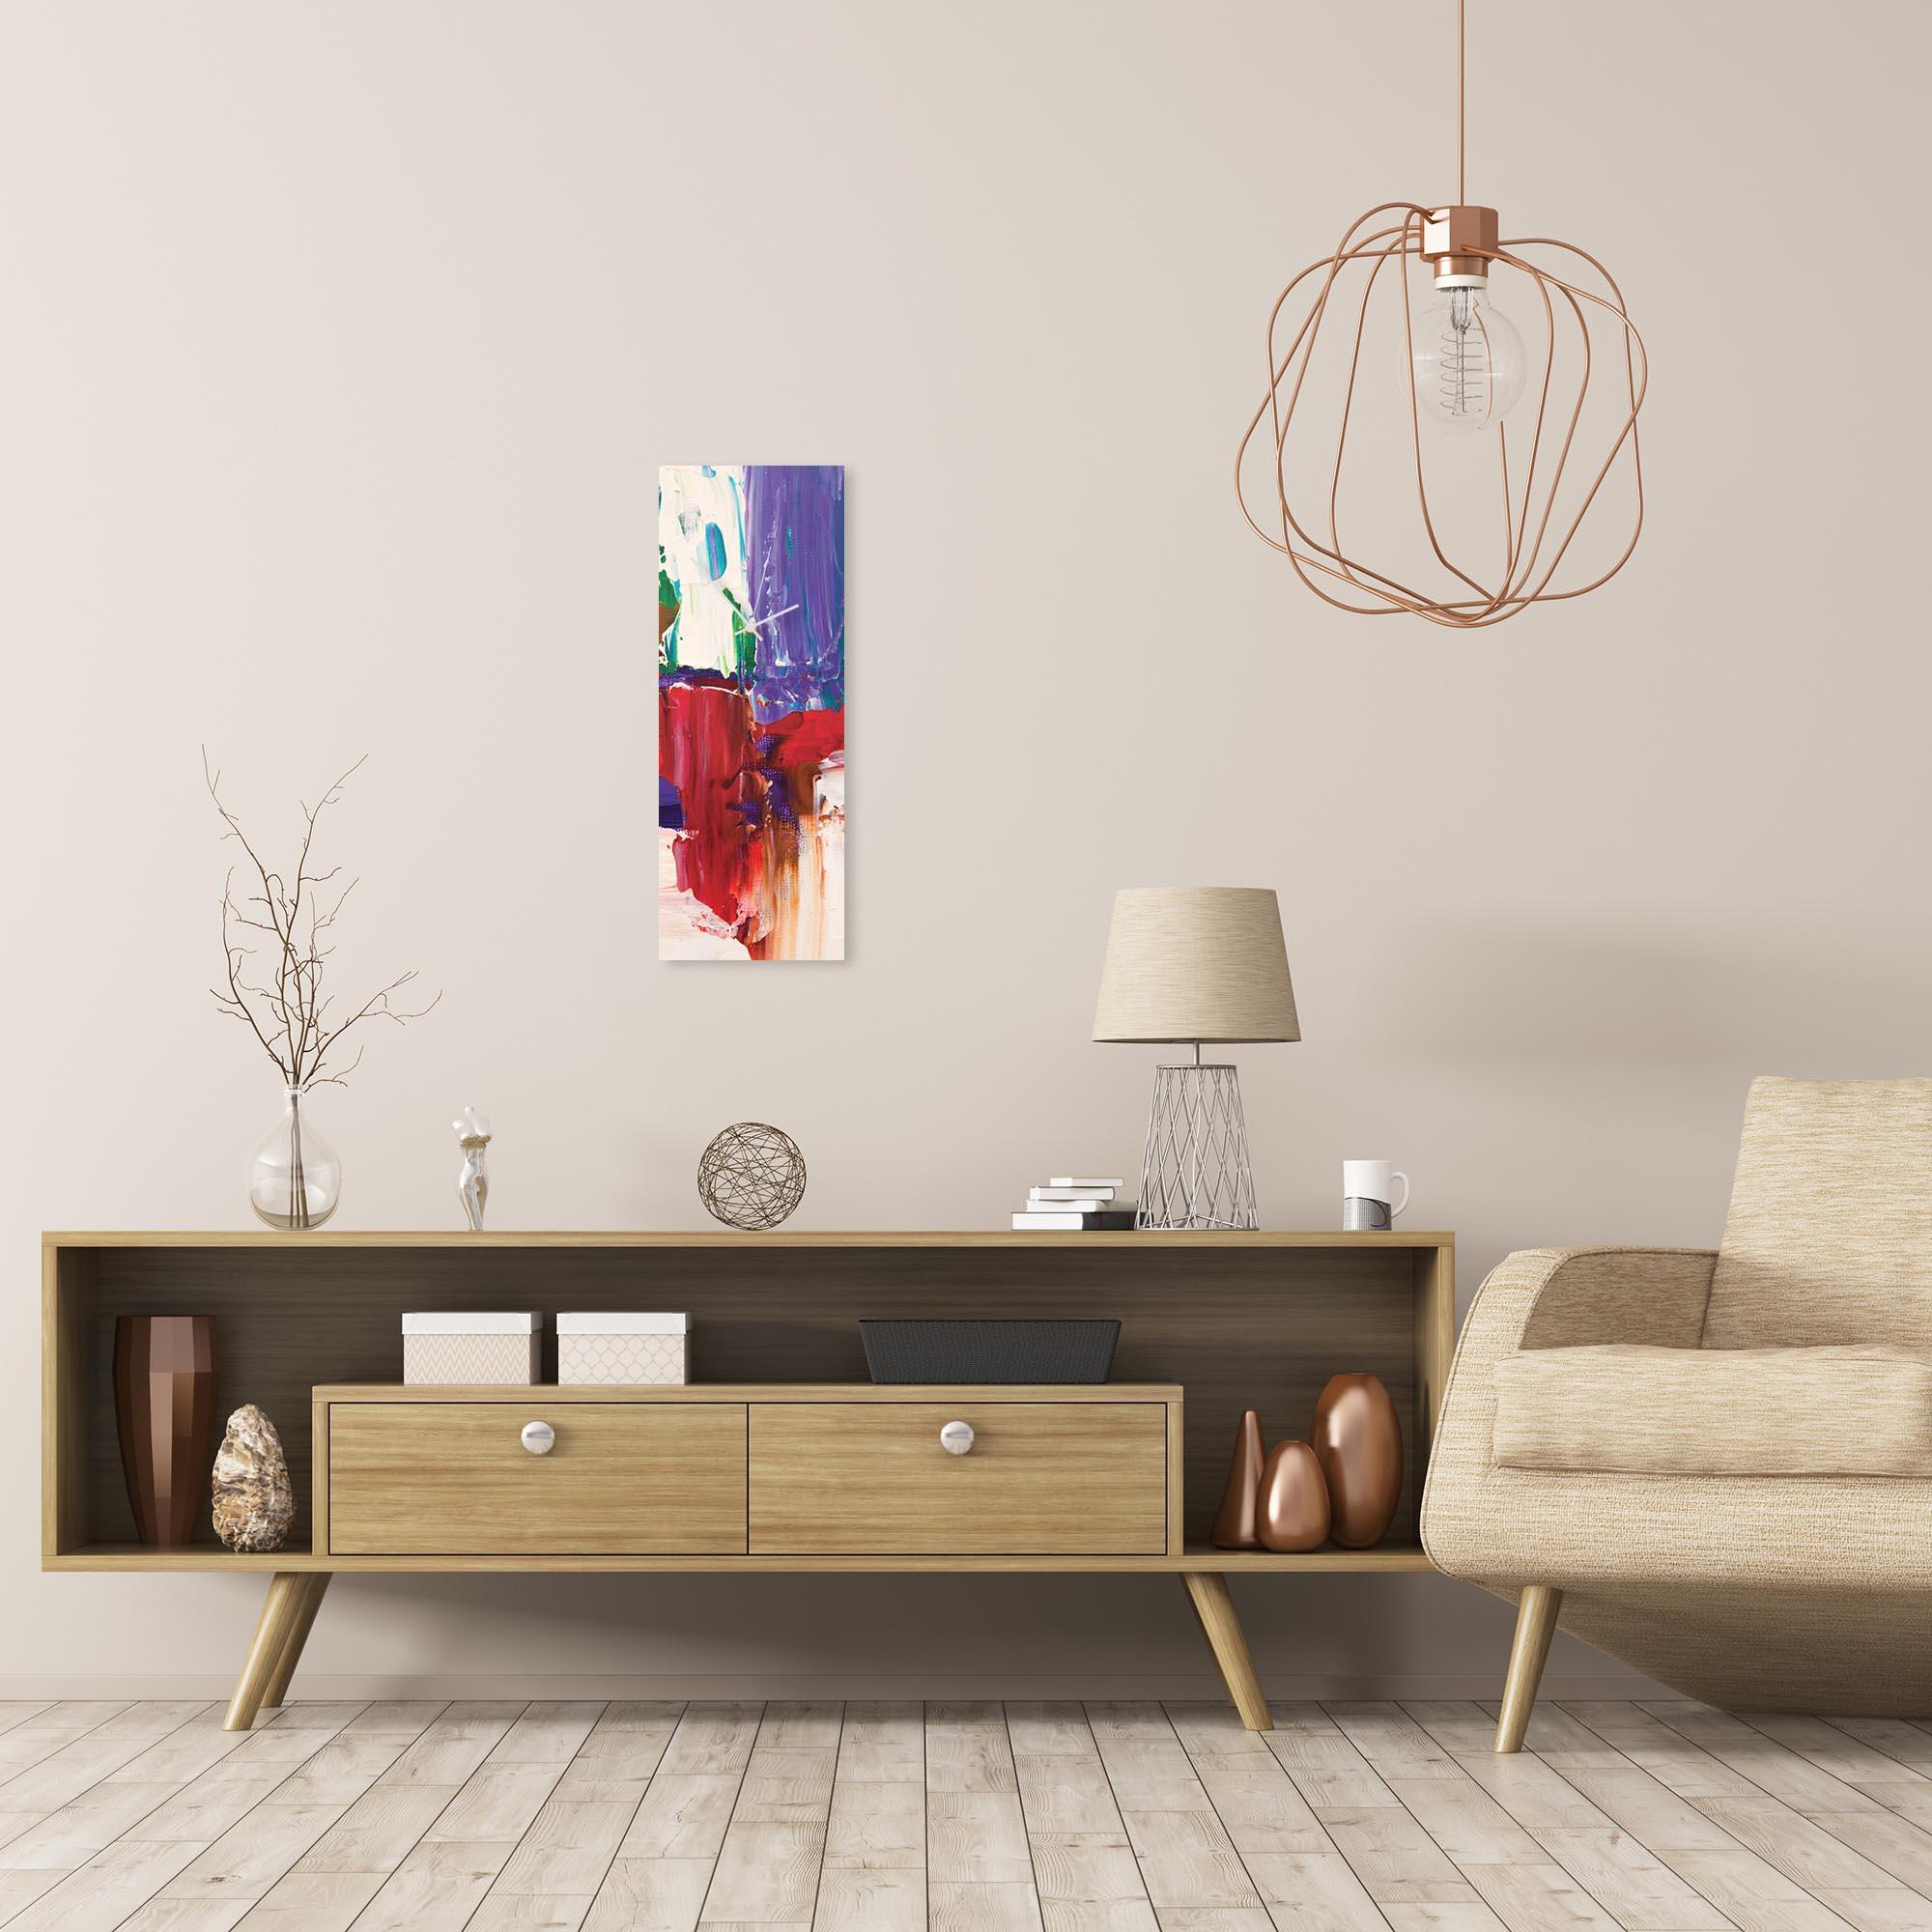 Urban Earth v6 Clock Large by Celeste Reiter Modern Wall Clock on Metal - Alternate View 1